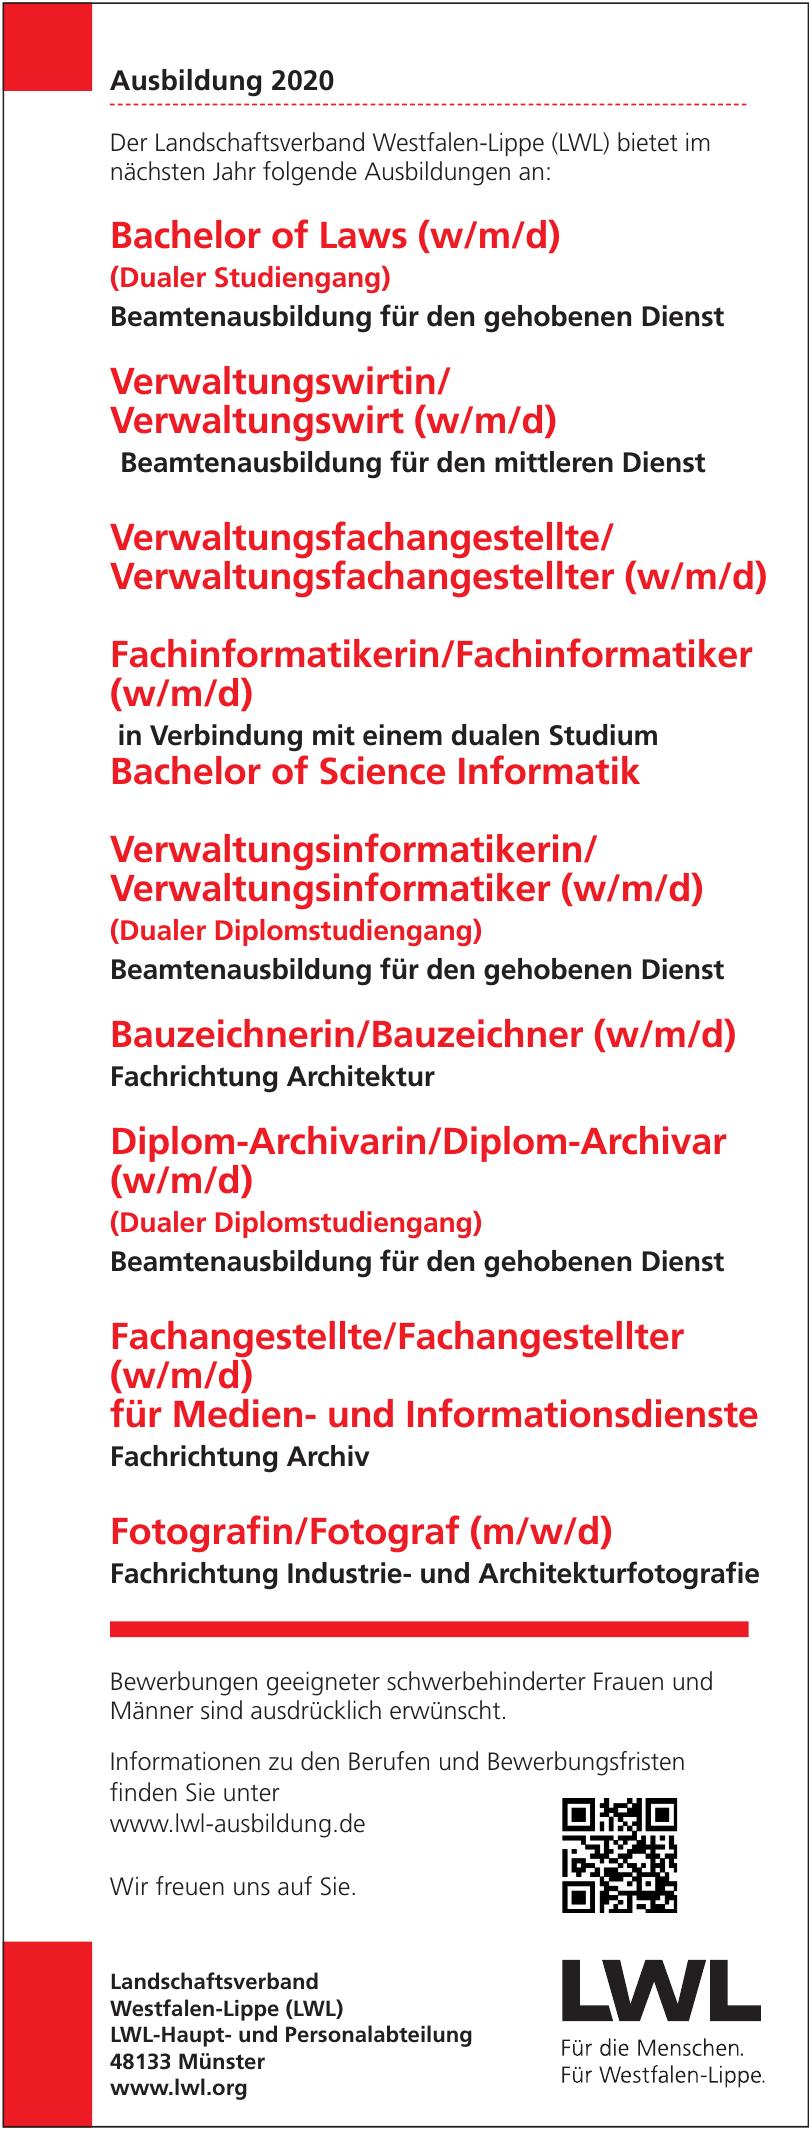 Landschaftsverband Westfalen-Lippe (LWL)